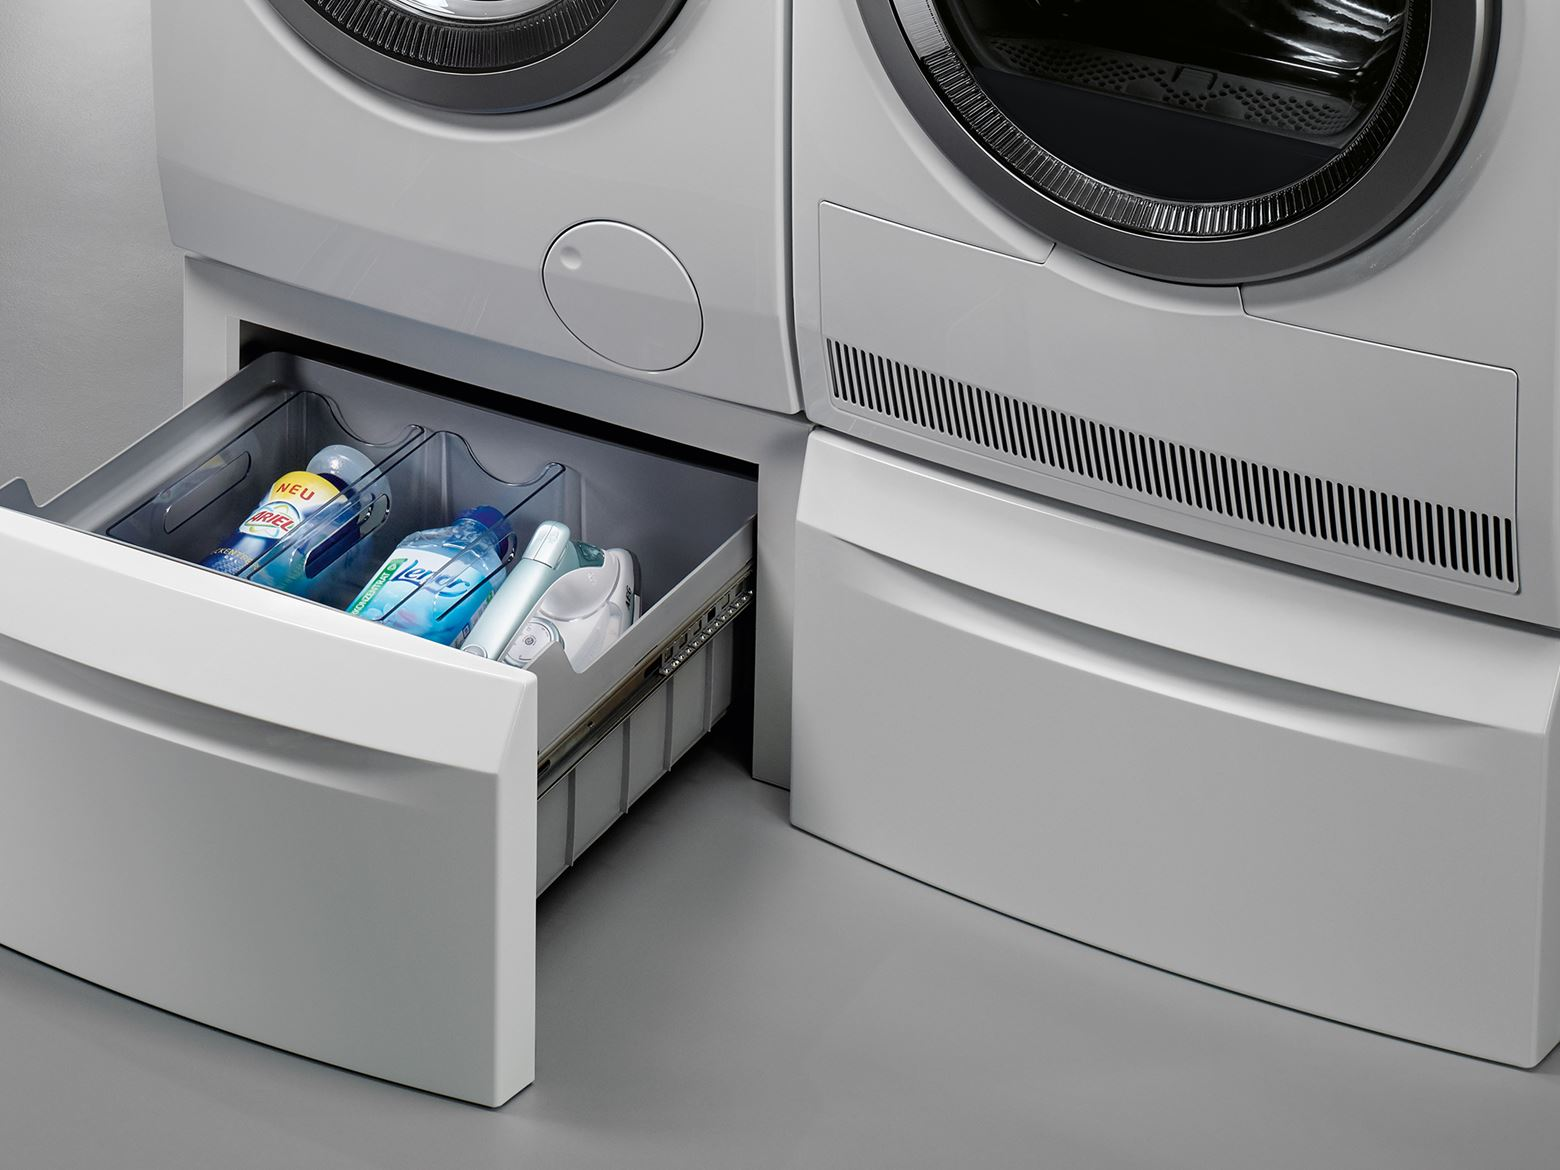 aeg_laundry_pedestal